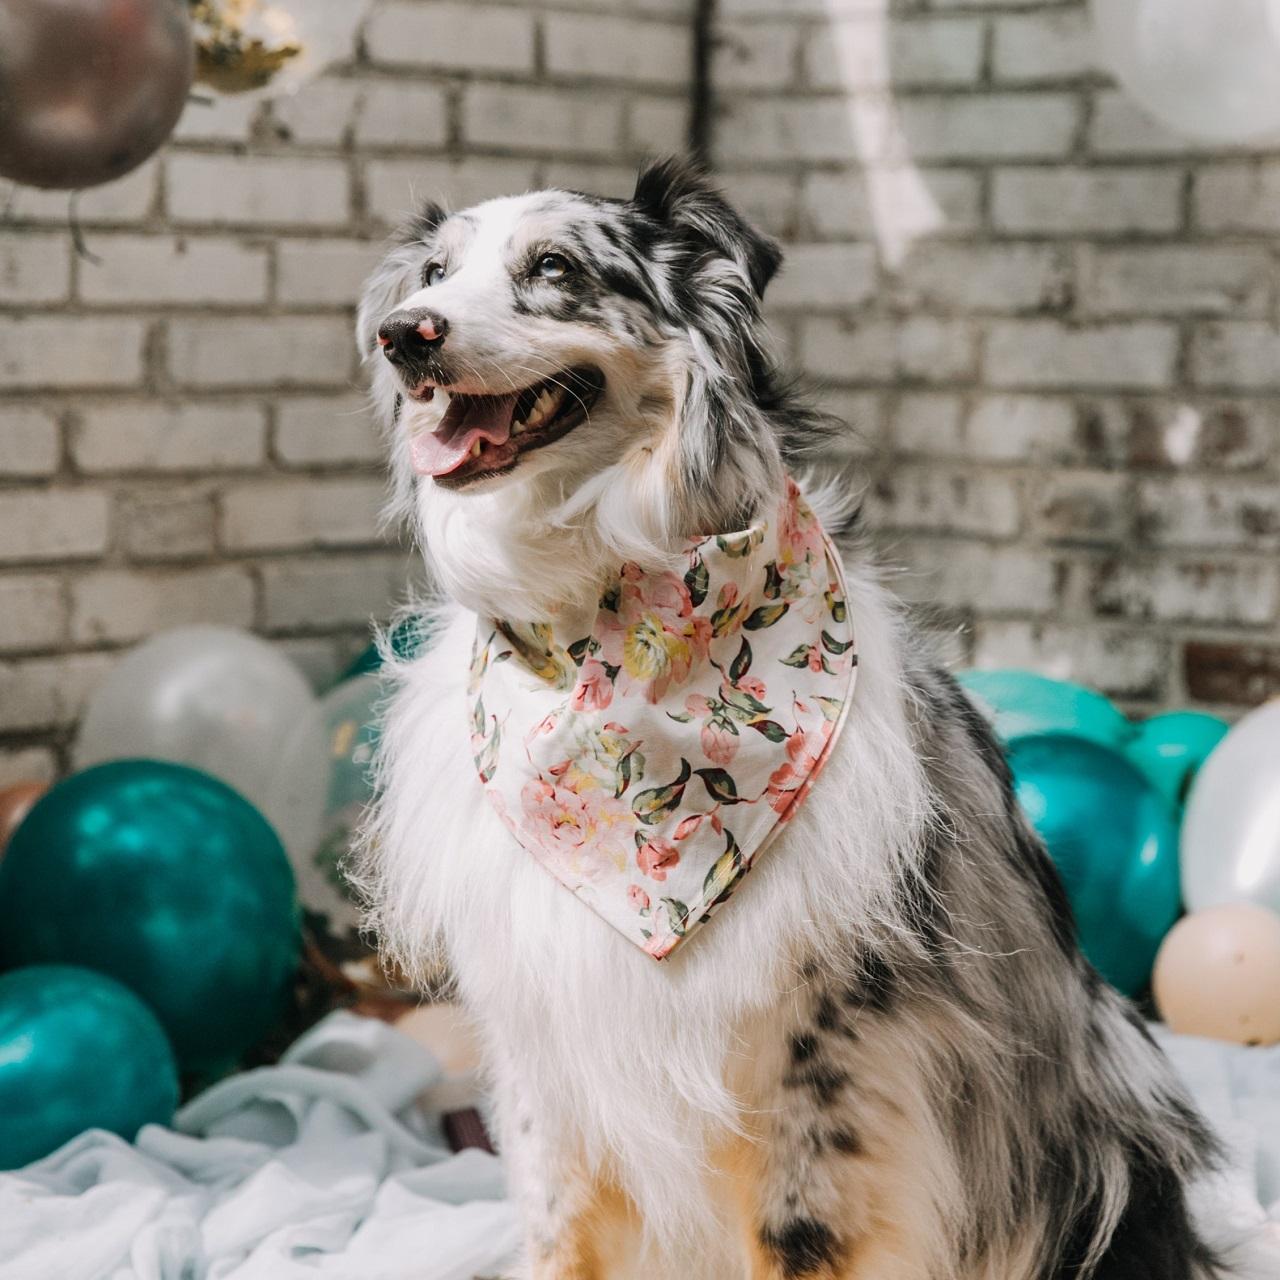 a dog wearing a floral bandana